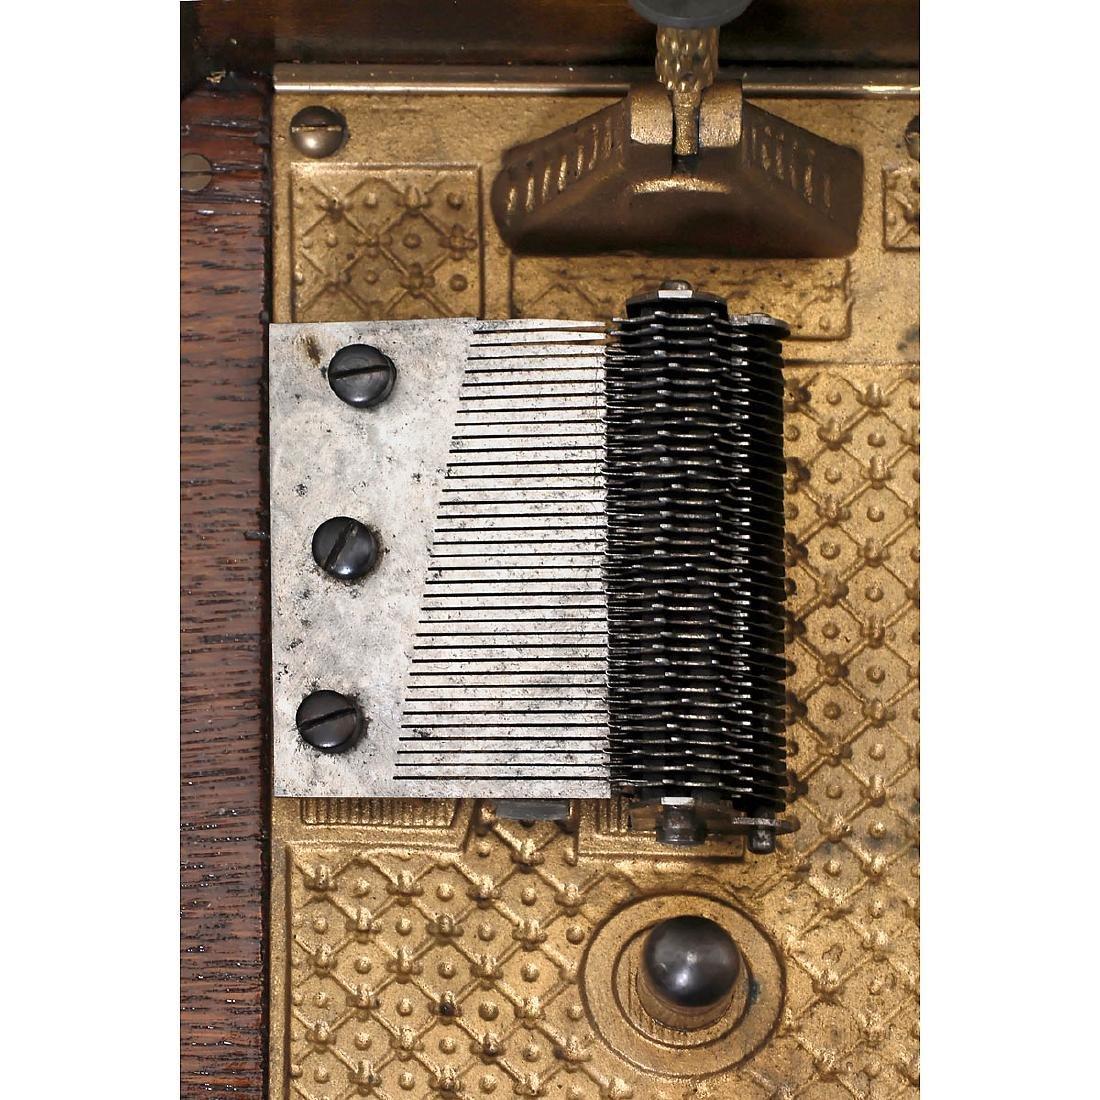 Kalliope Disc Musical Box, c. 1900 - 2